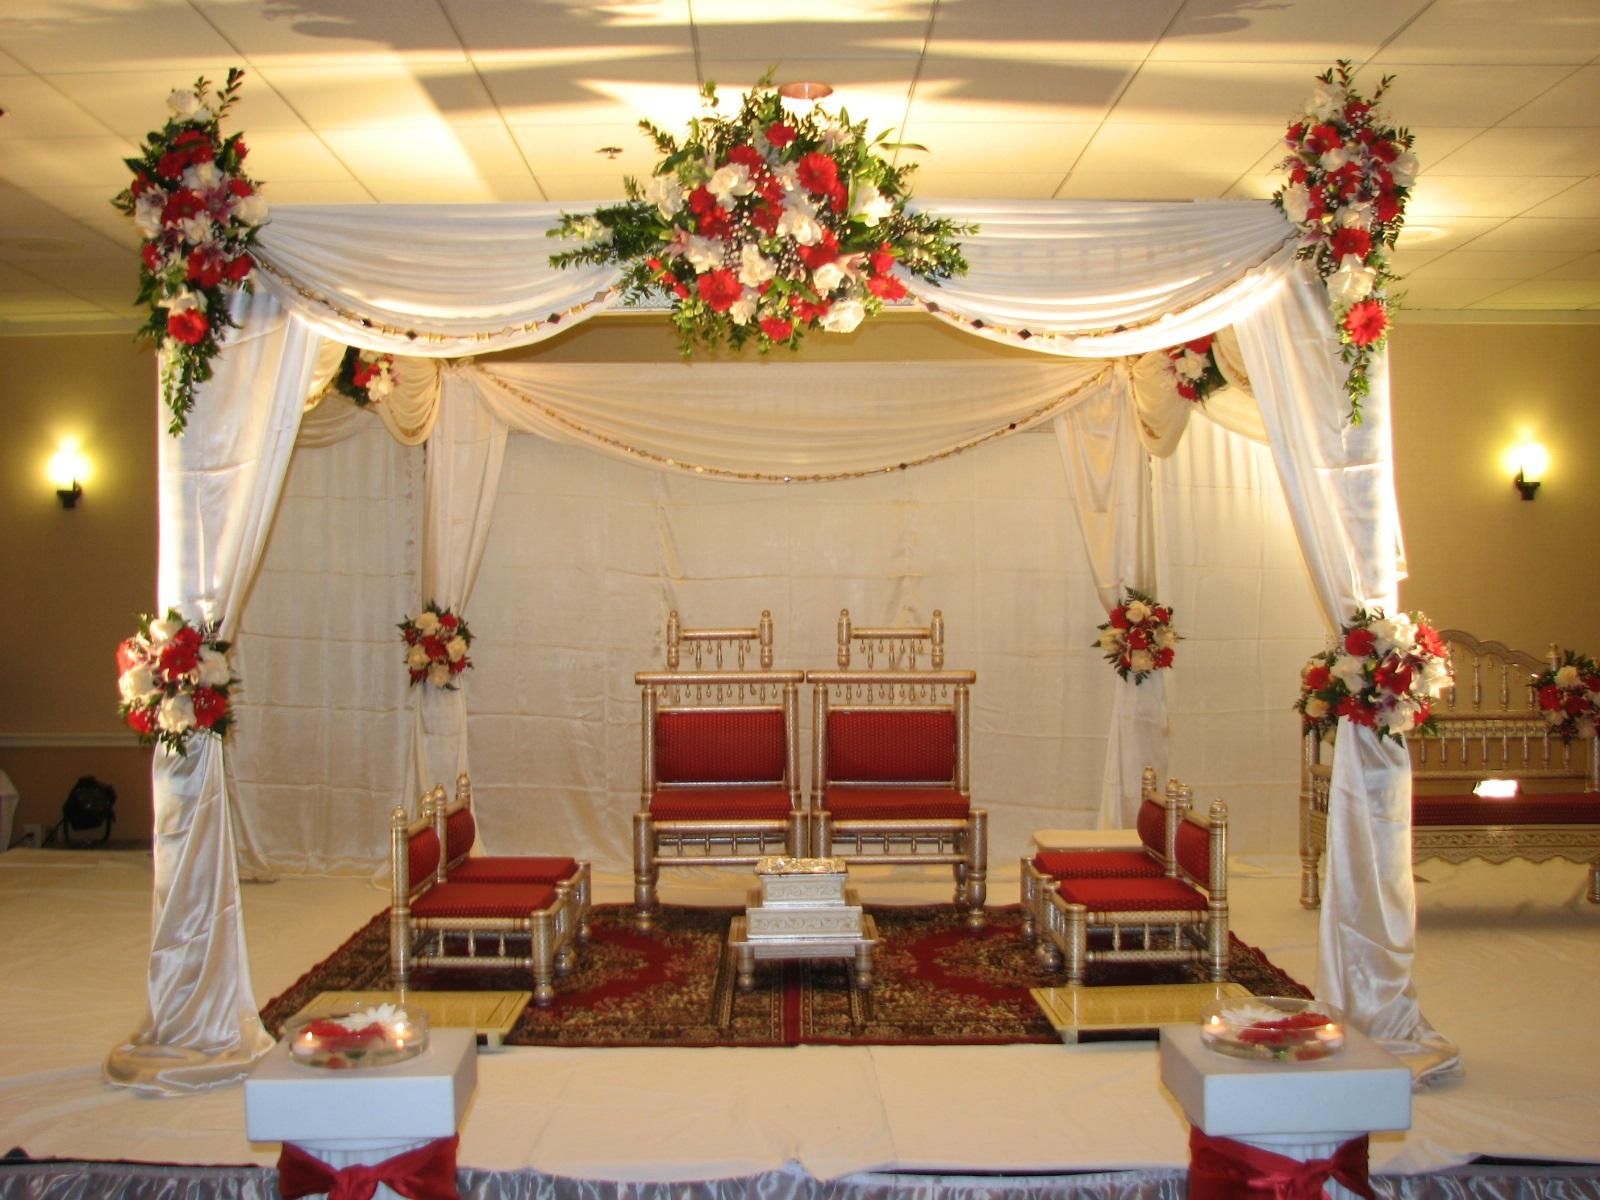 Fabulous Wedding Decorations Can Make A Wedding Flawless